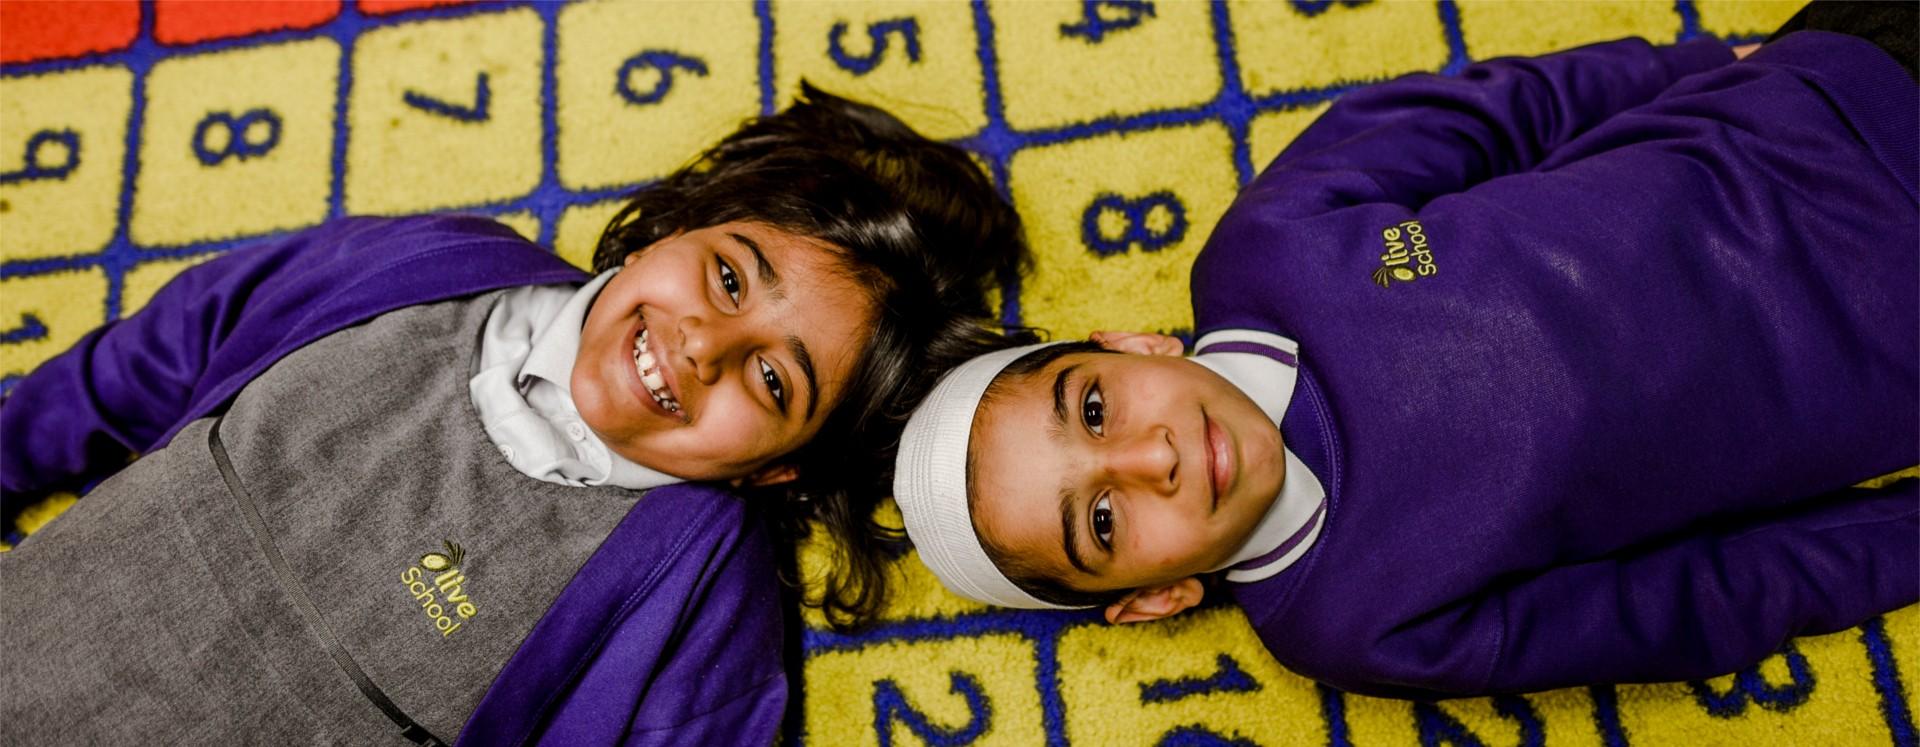 OliveSchool-0808-banner